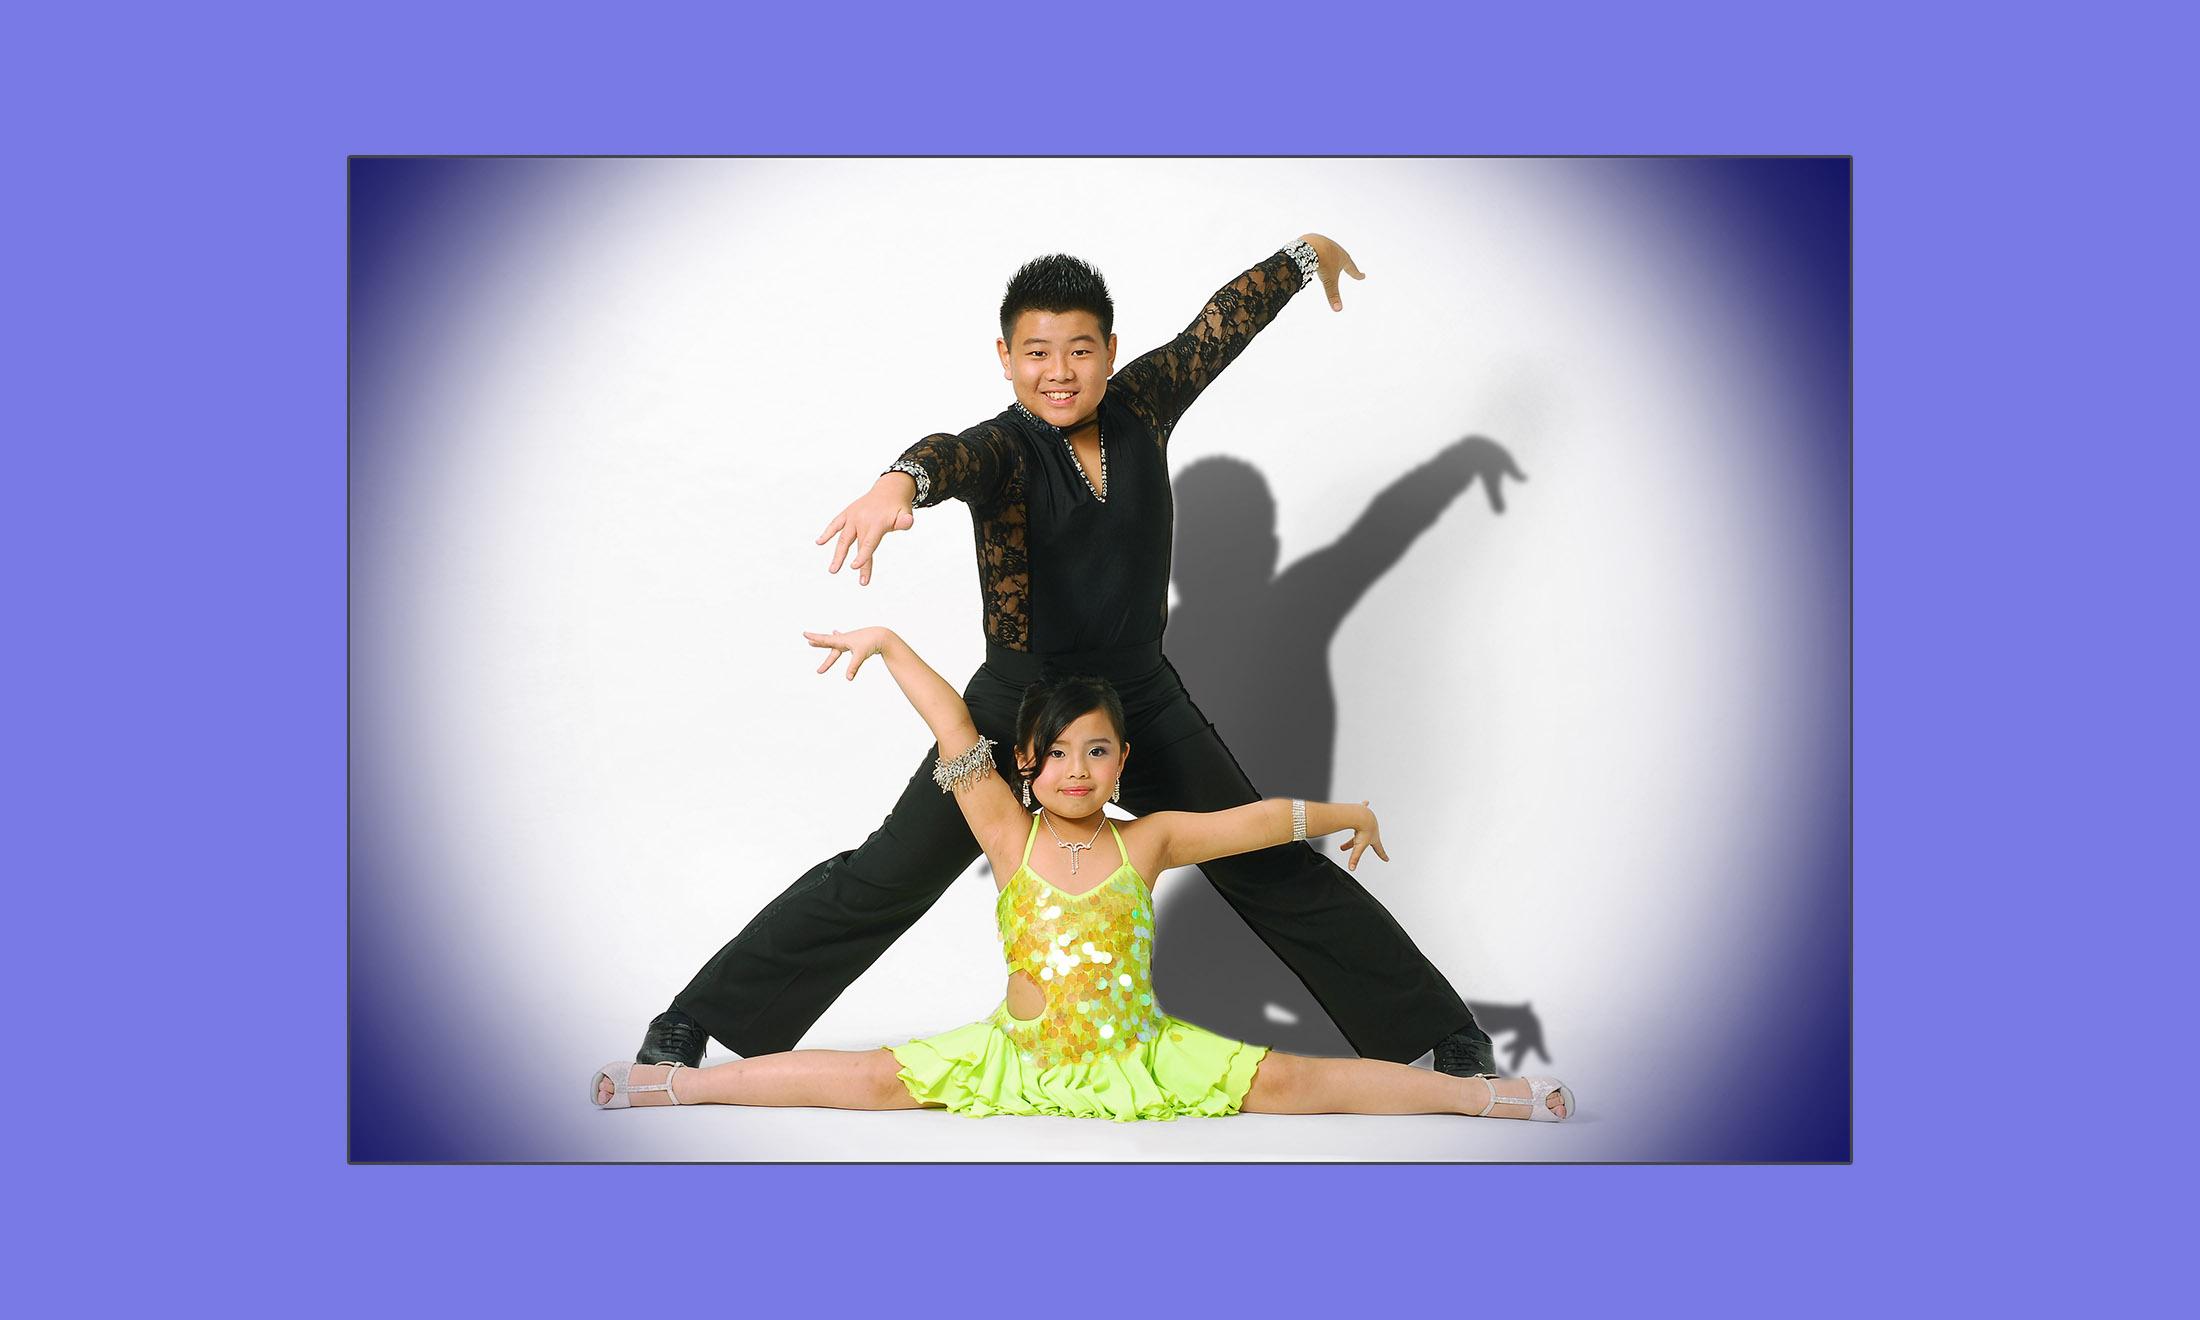 2 dancer kid 04